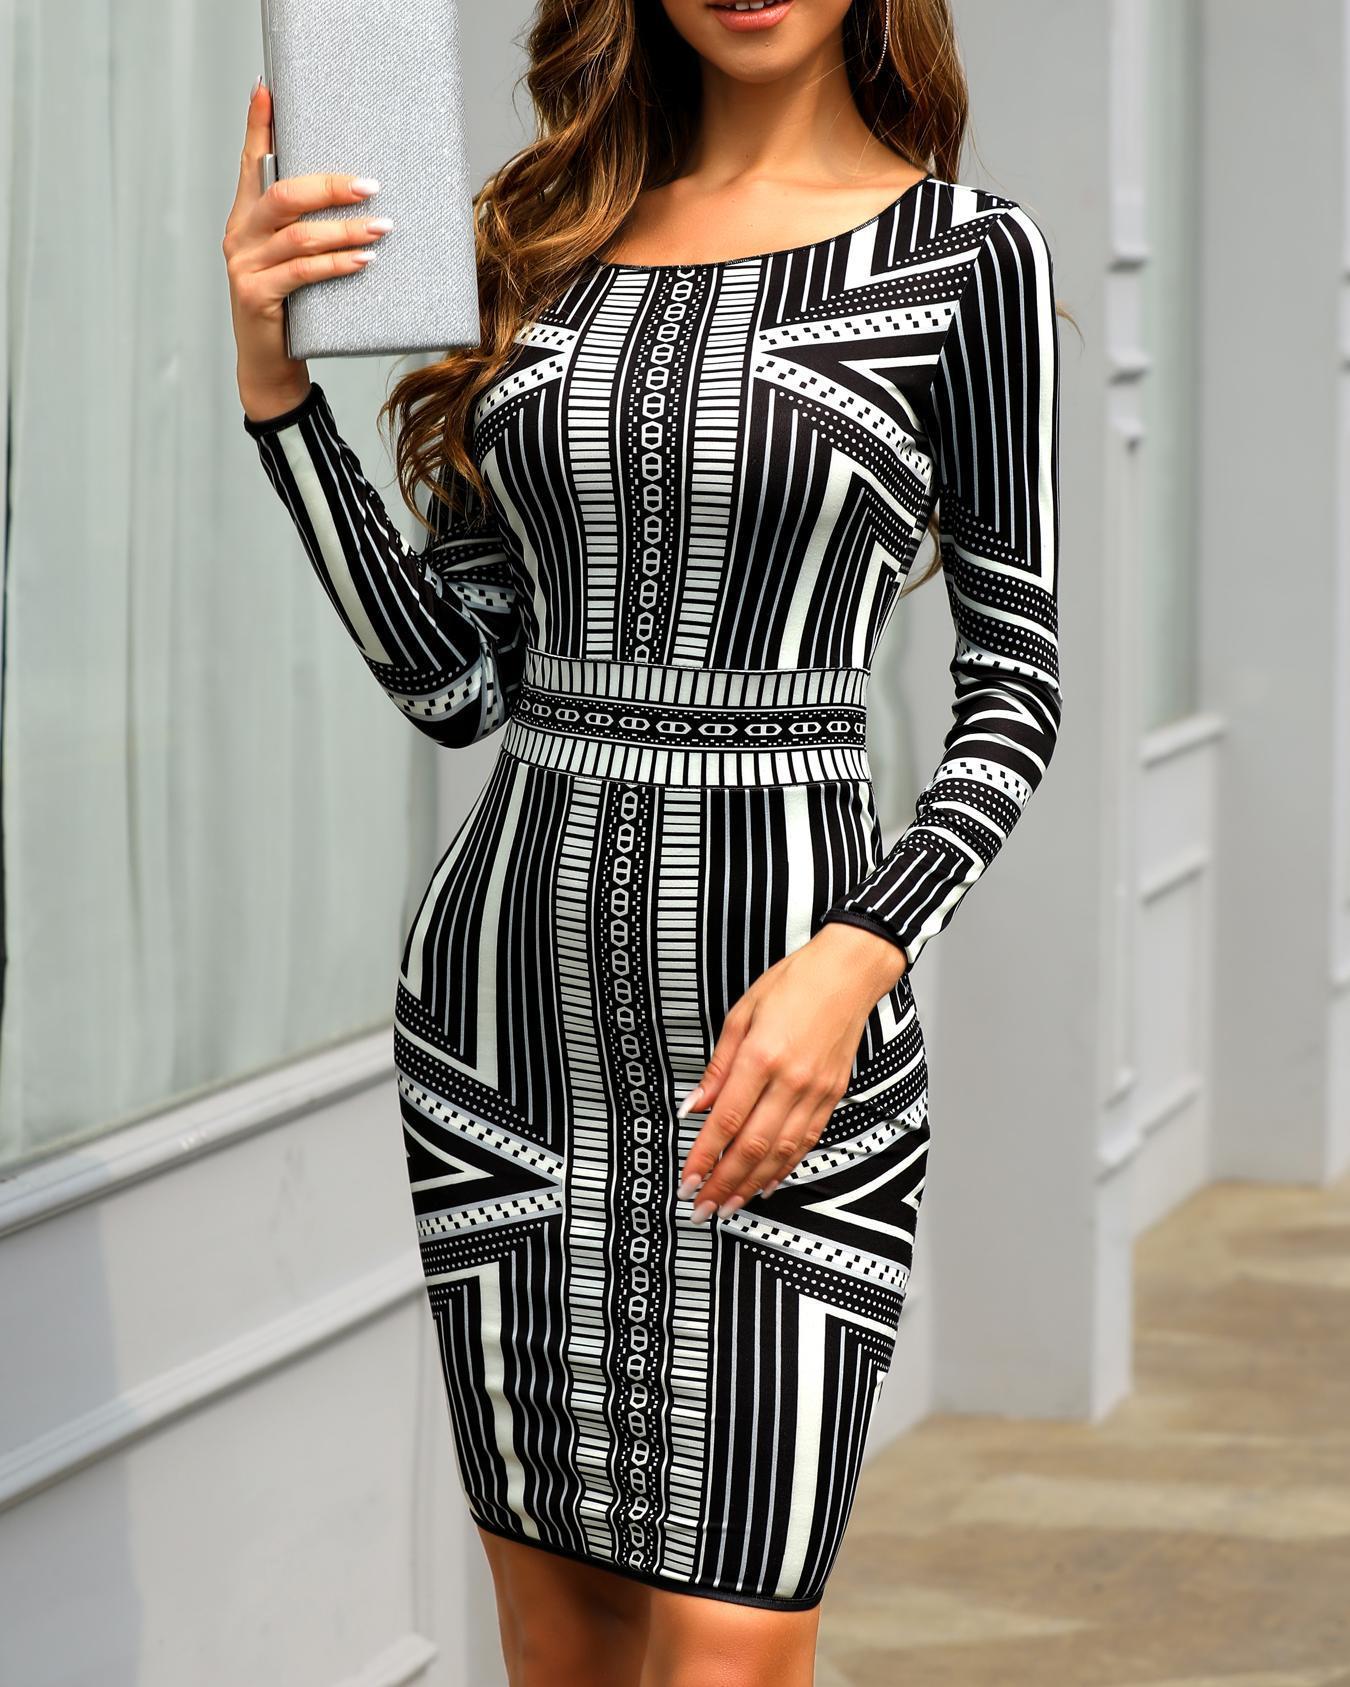 joyshoetique / Long Sleeve Print Bodycon Dress